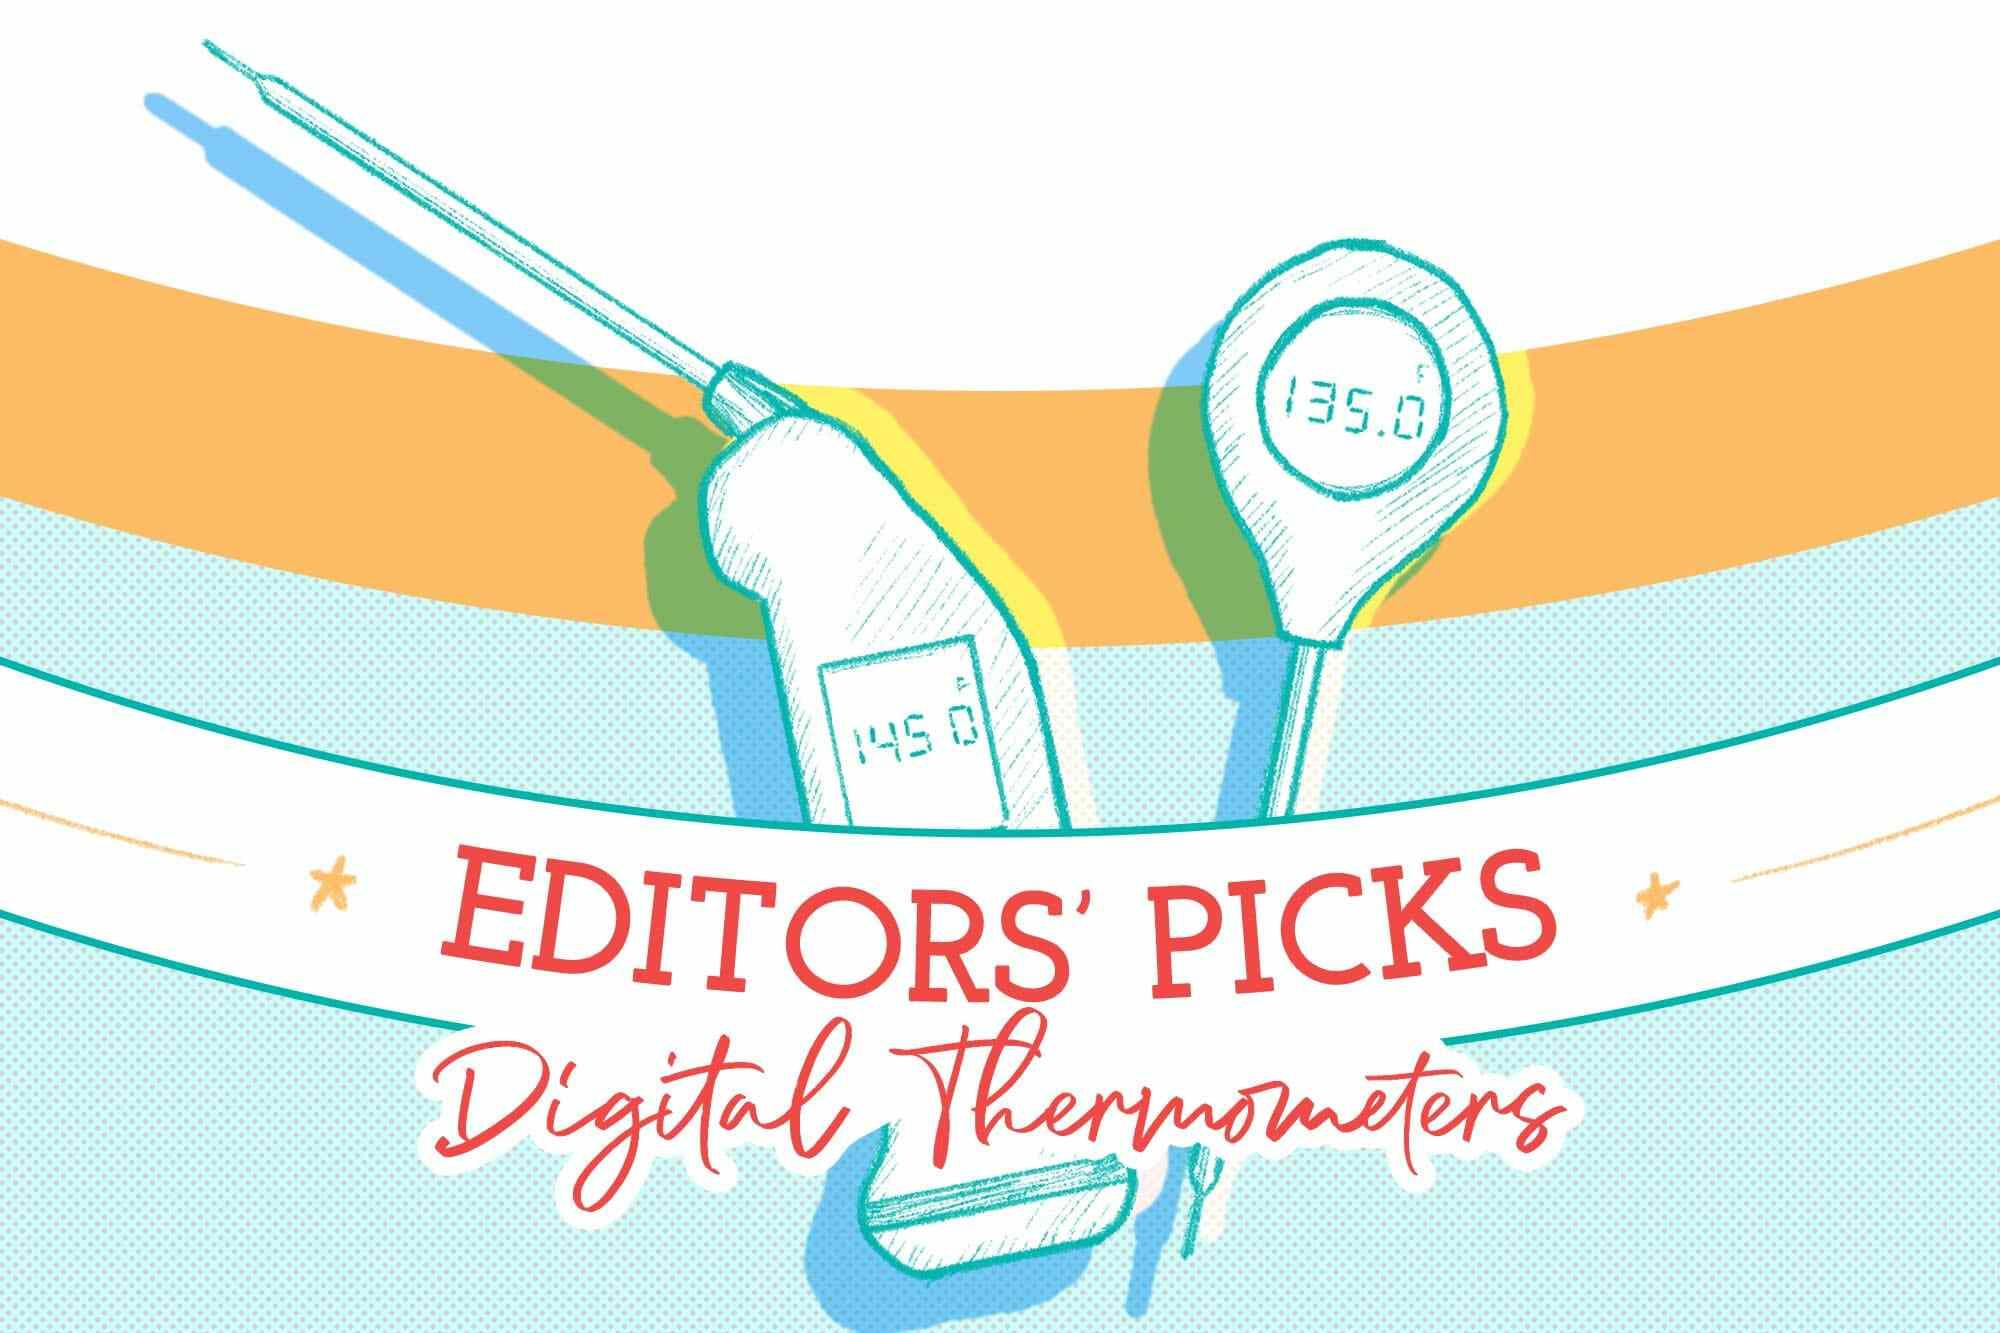 editors' picks digital thermometers